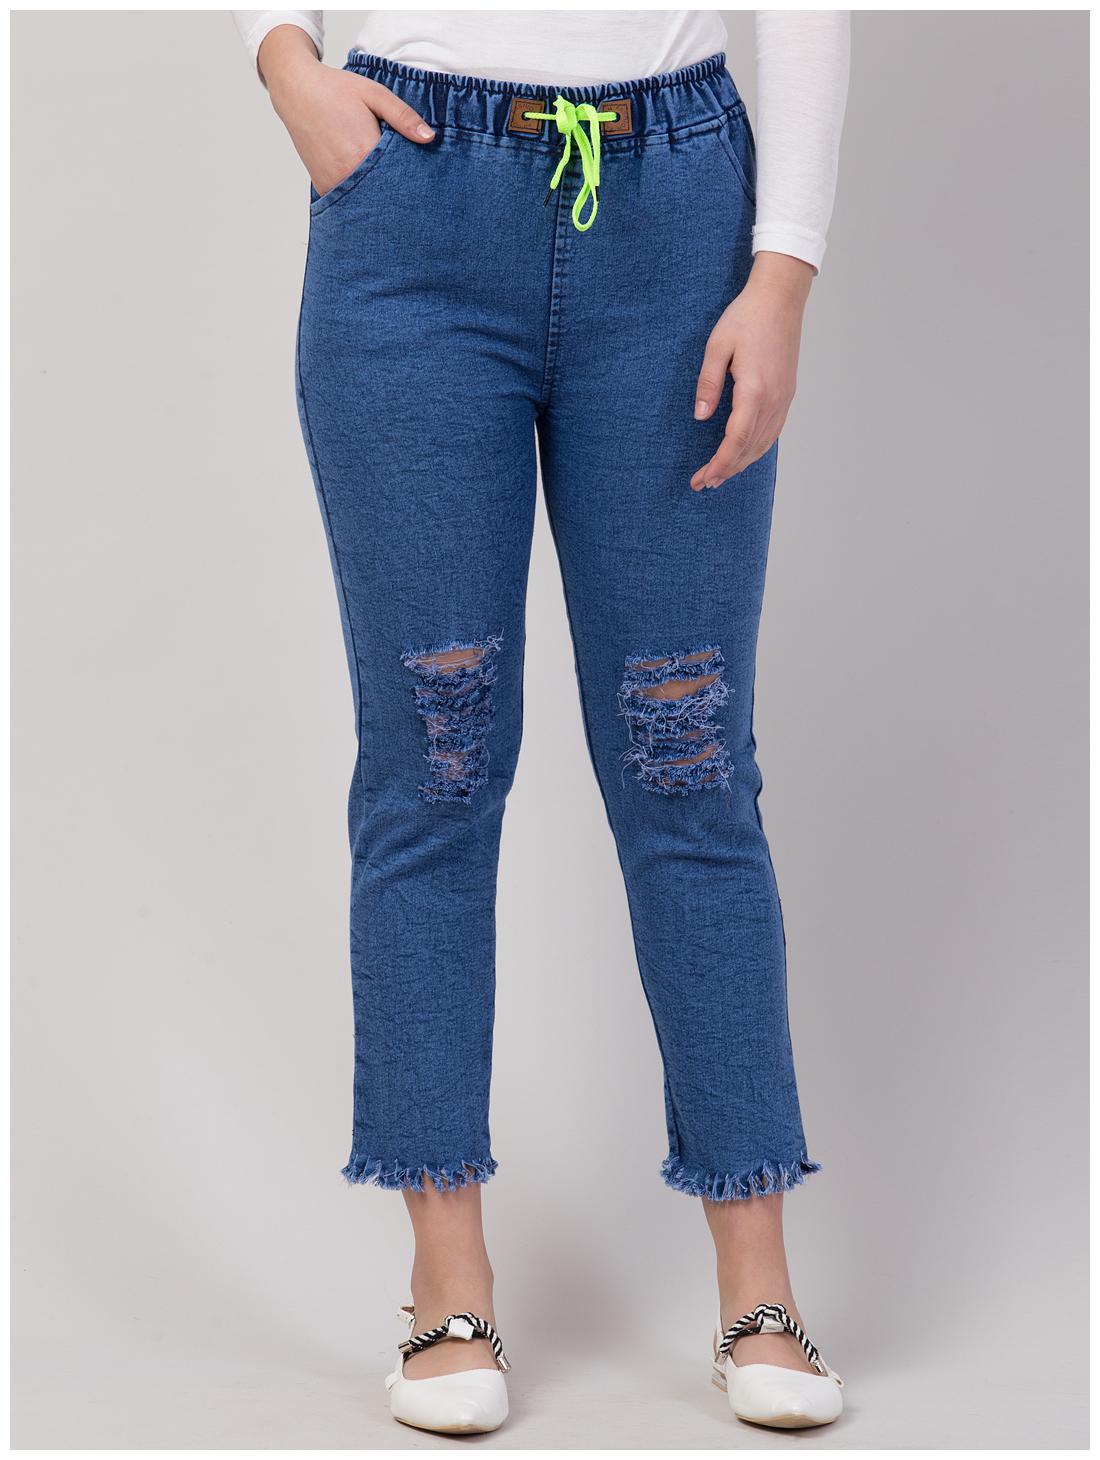 Vogue Tantra Women Blue Slim fit Jeans by Vogue Tantra